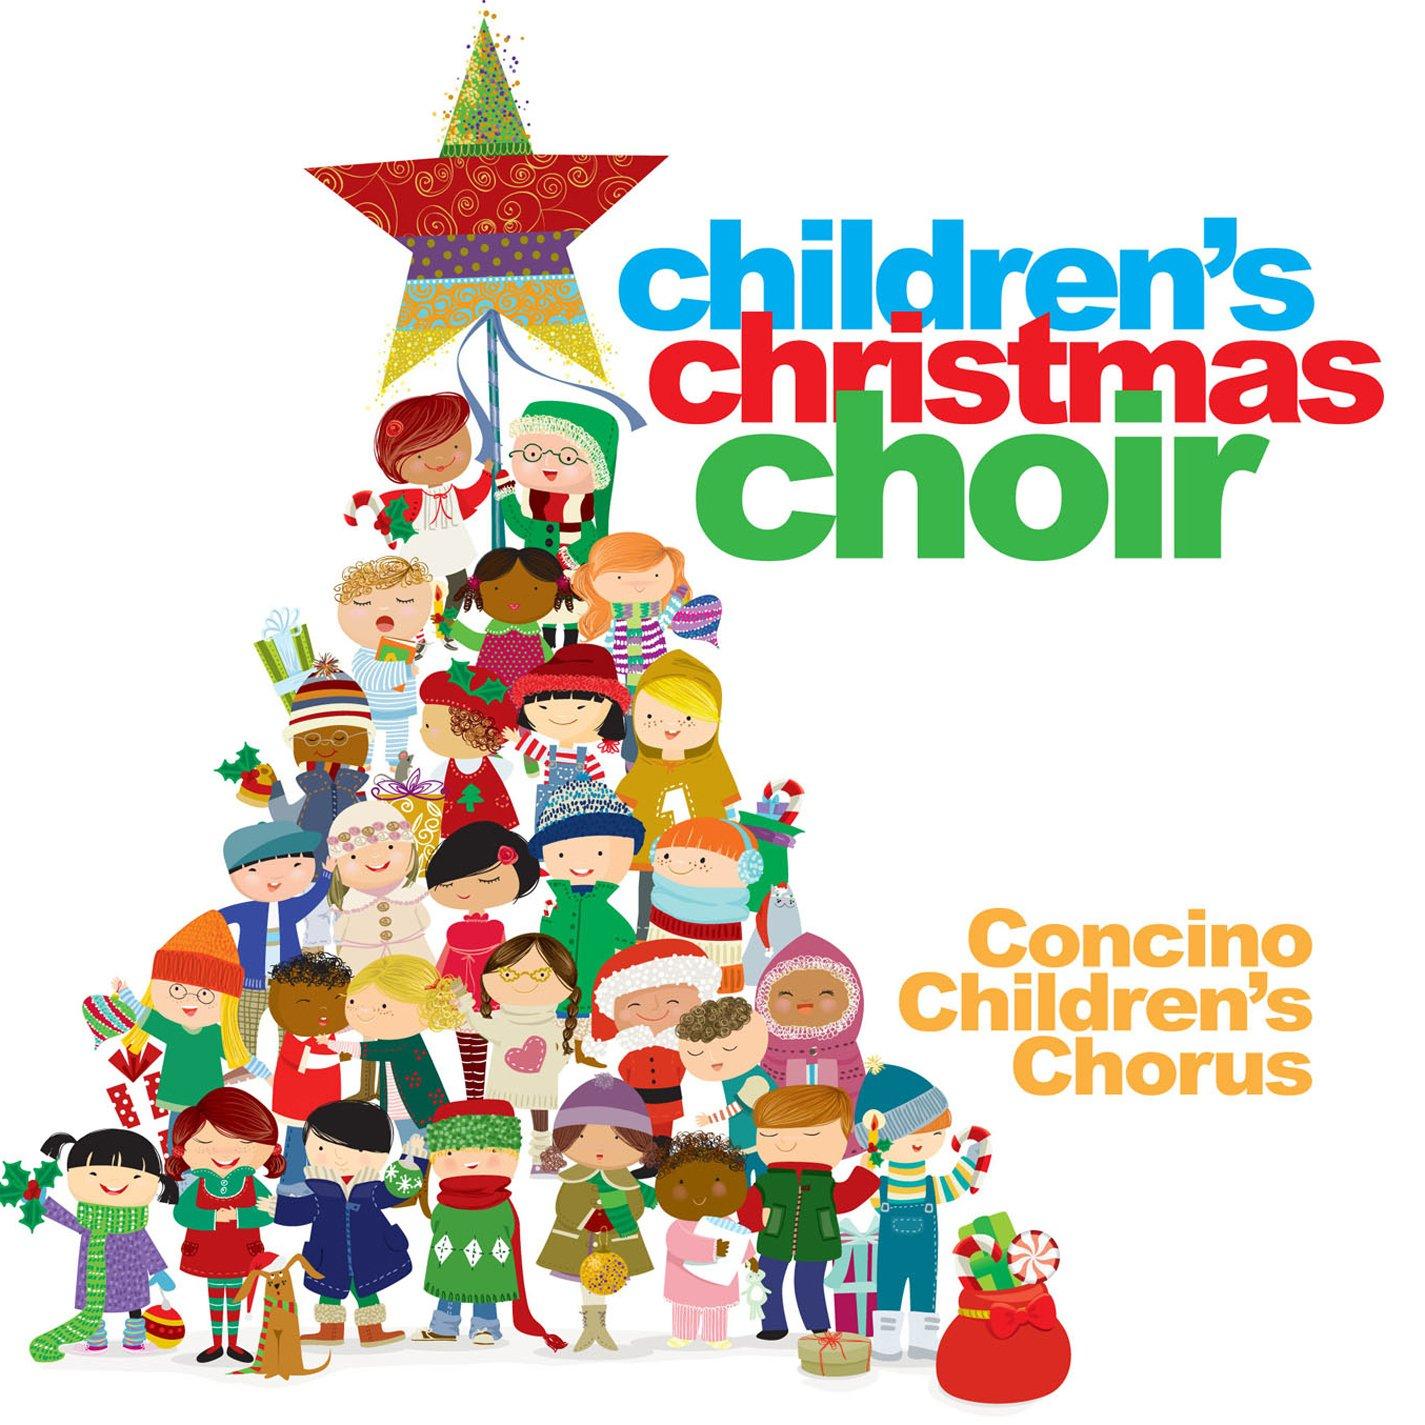 Concino Children S Chorus Children S Christmas Choir Amazon Com Music